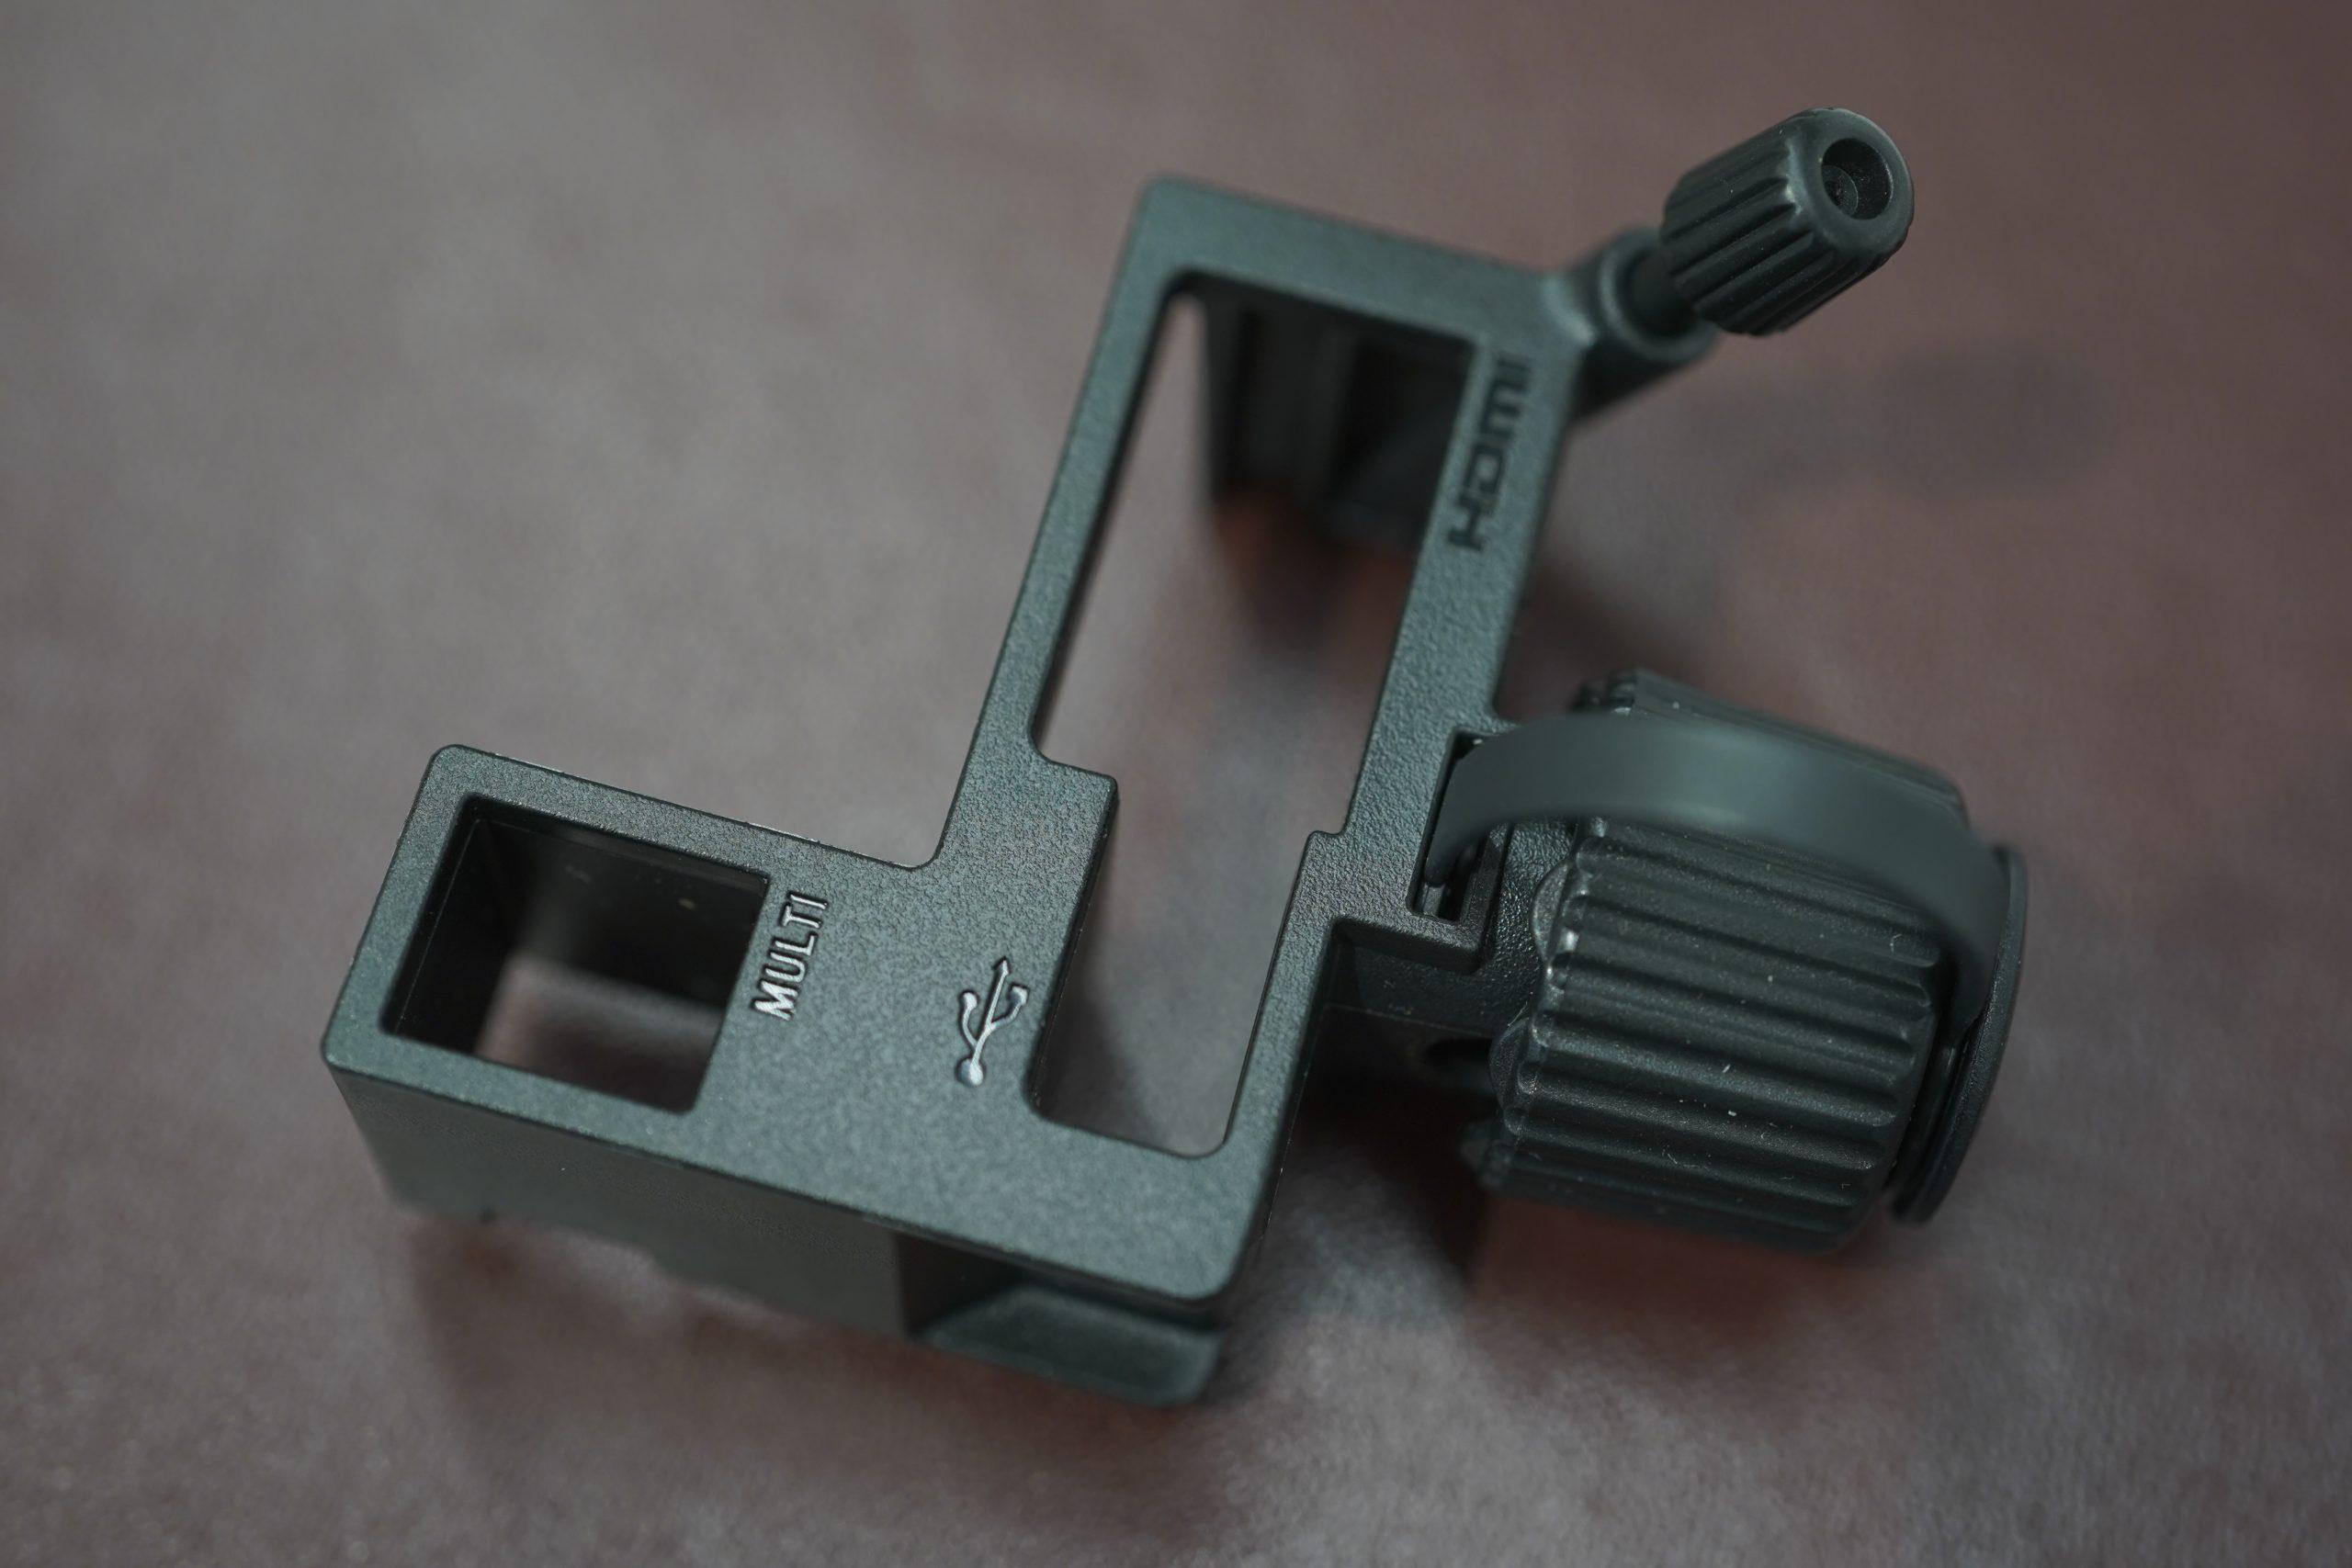 【SONY】Camera Technique Vol.21 ケーブルプロテクターとは。